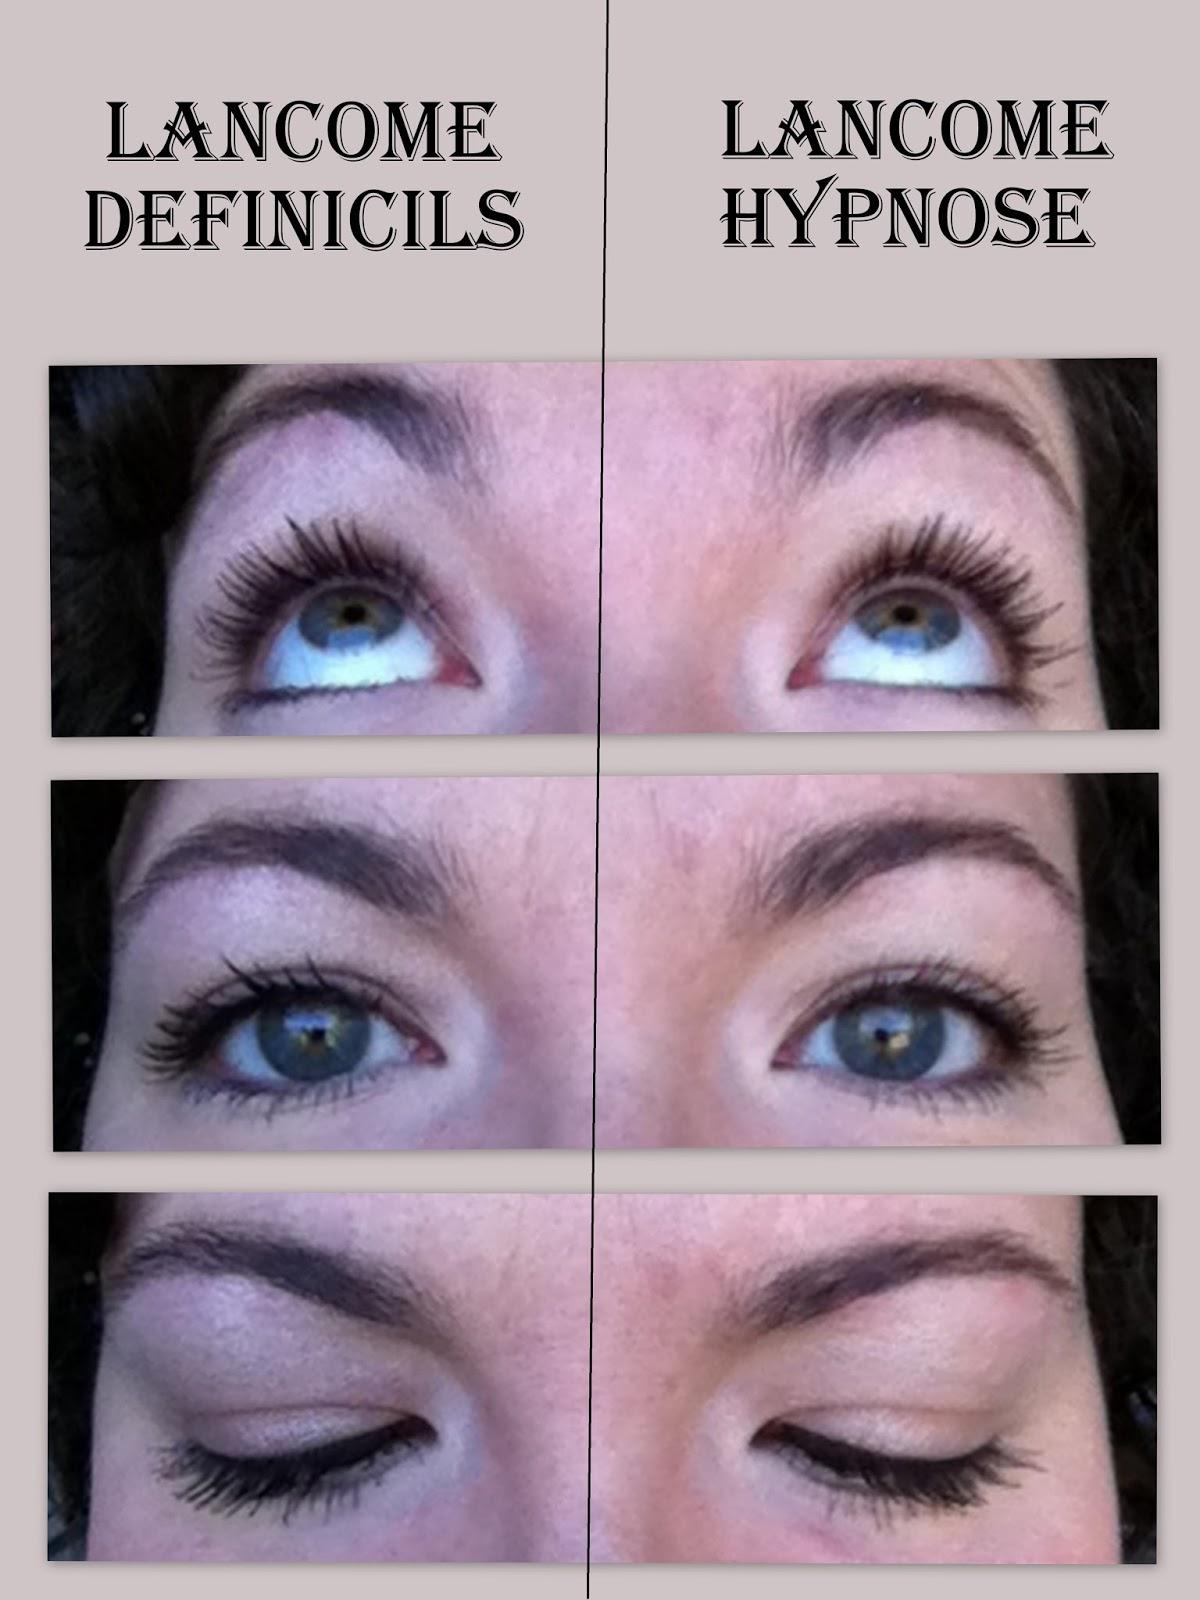 Bluntly Reviewed: Lancome Definicils vs Lancome Hypnose Mascara ...